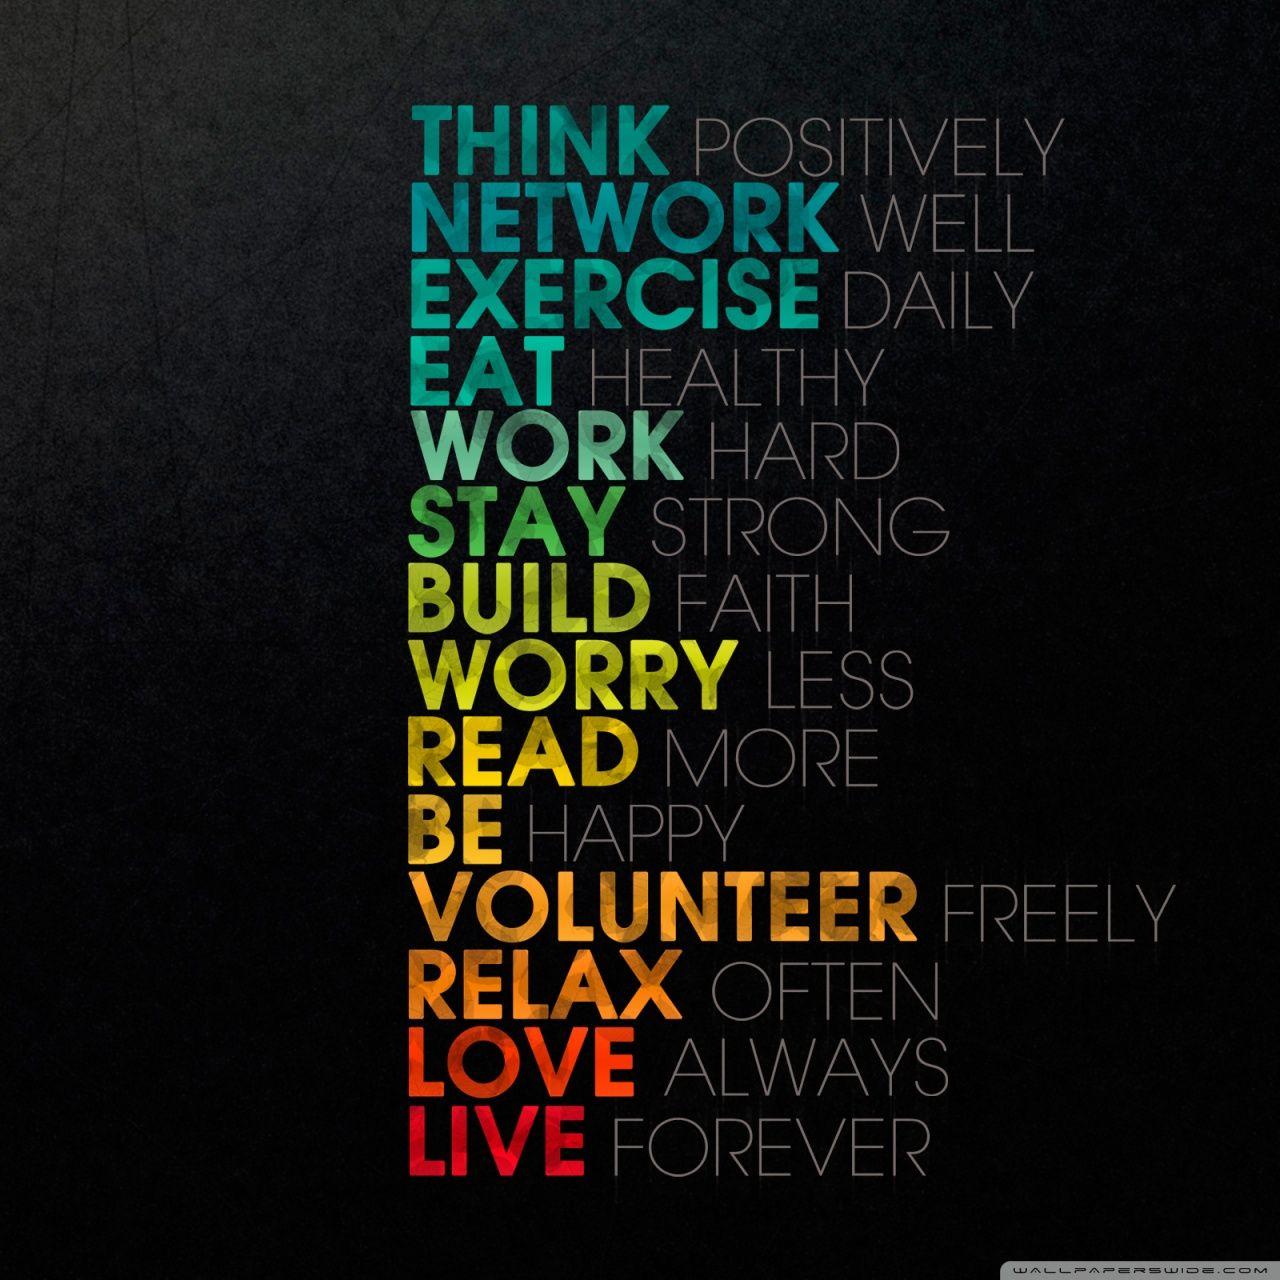 Motivational Hd Desktop Wallpaper High Definition Fullscreen Motivational Quotes Wallpaper Positivity Quotes